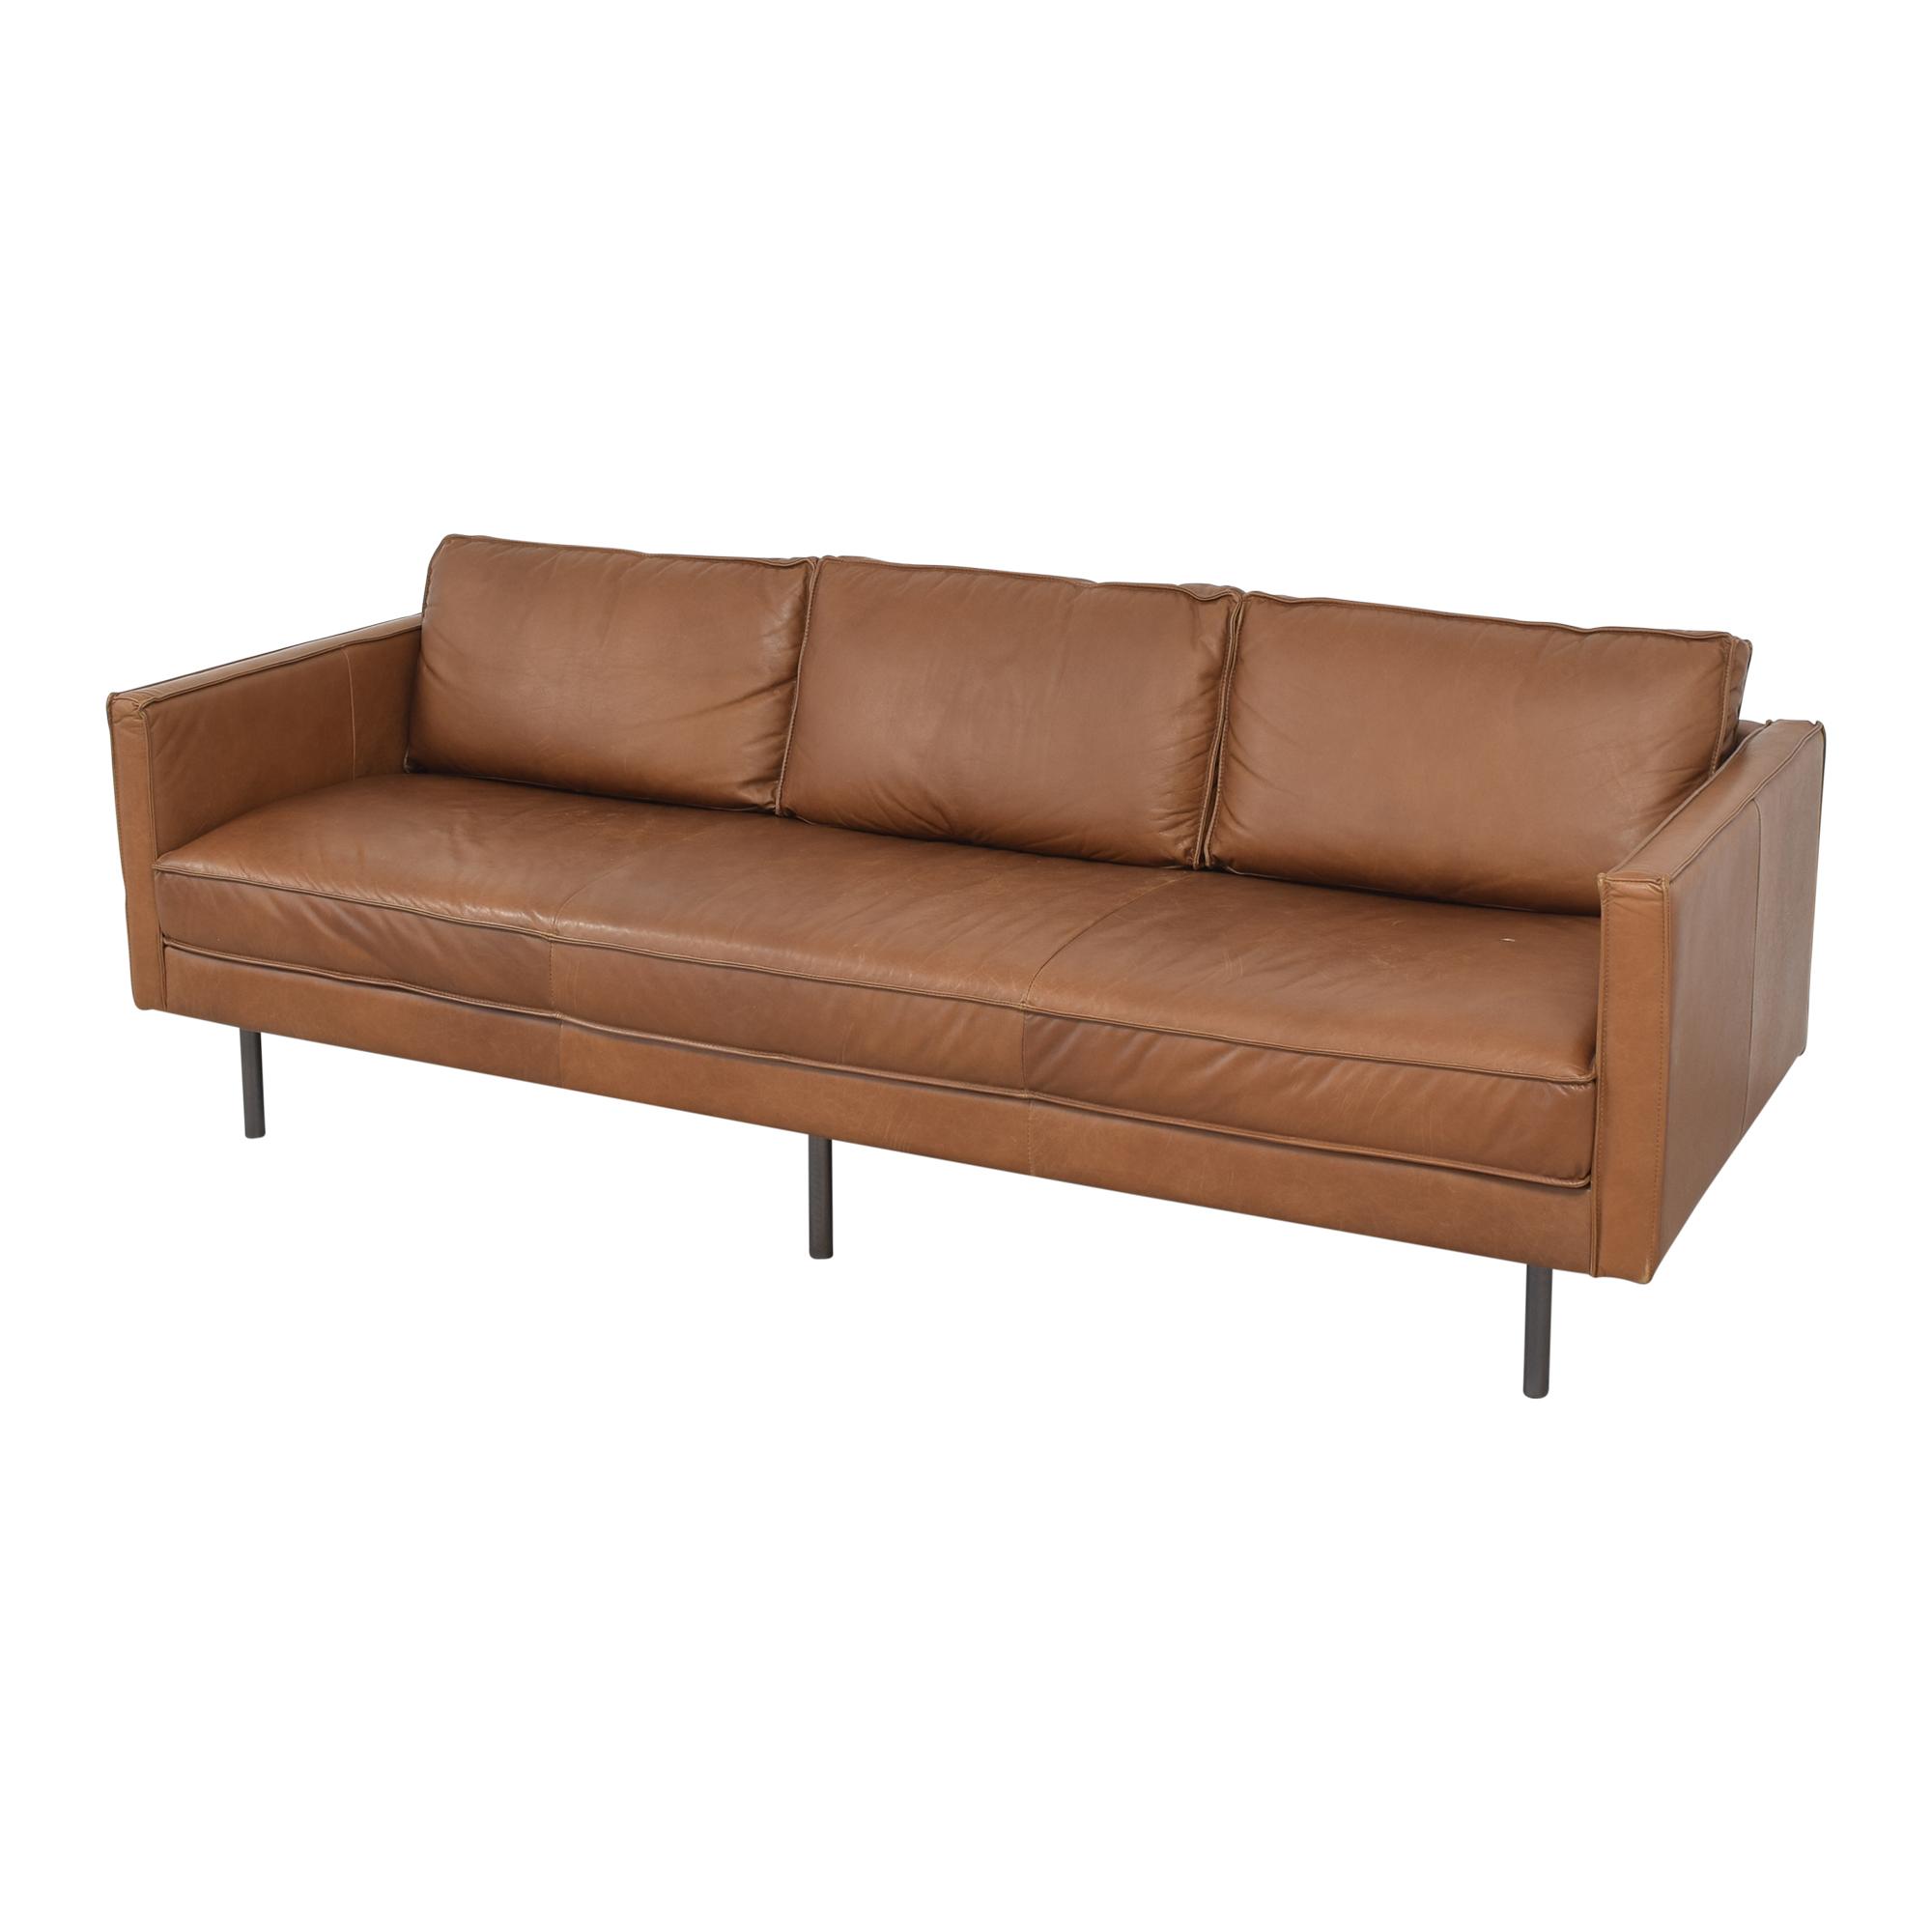 West Elm West Elm Axel Bench Cushion Sofa brown